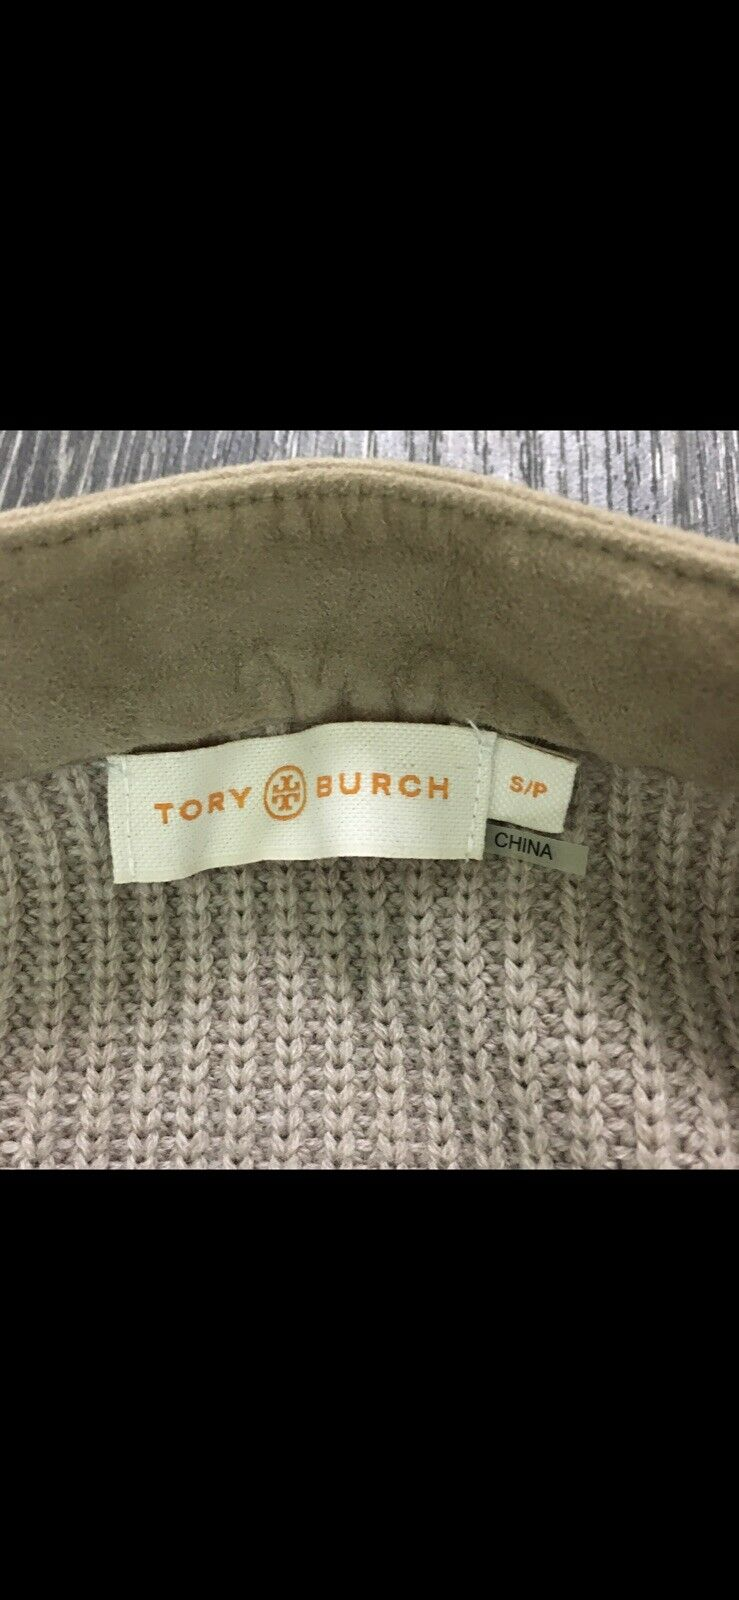 Tory Burch Wool/Suede Cardigan Blazer Size Small  - image 4